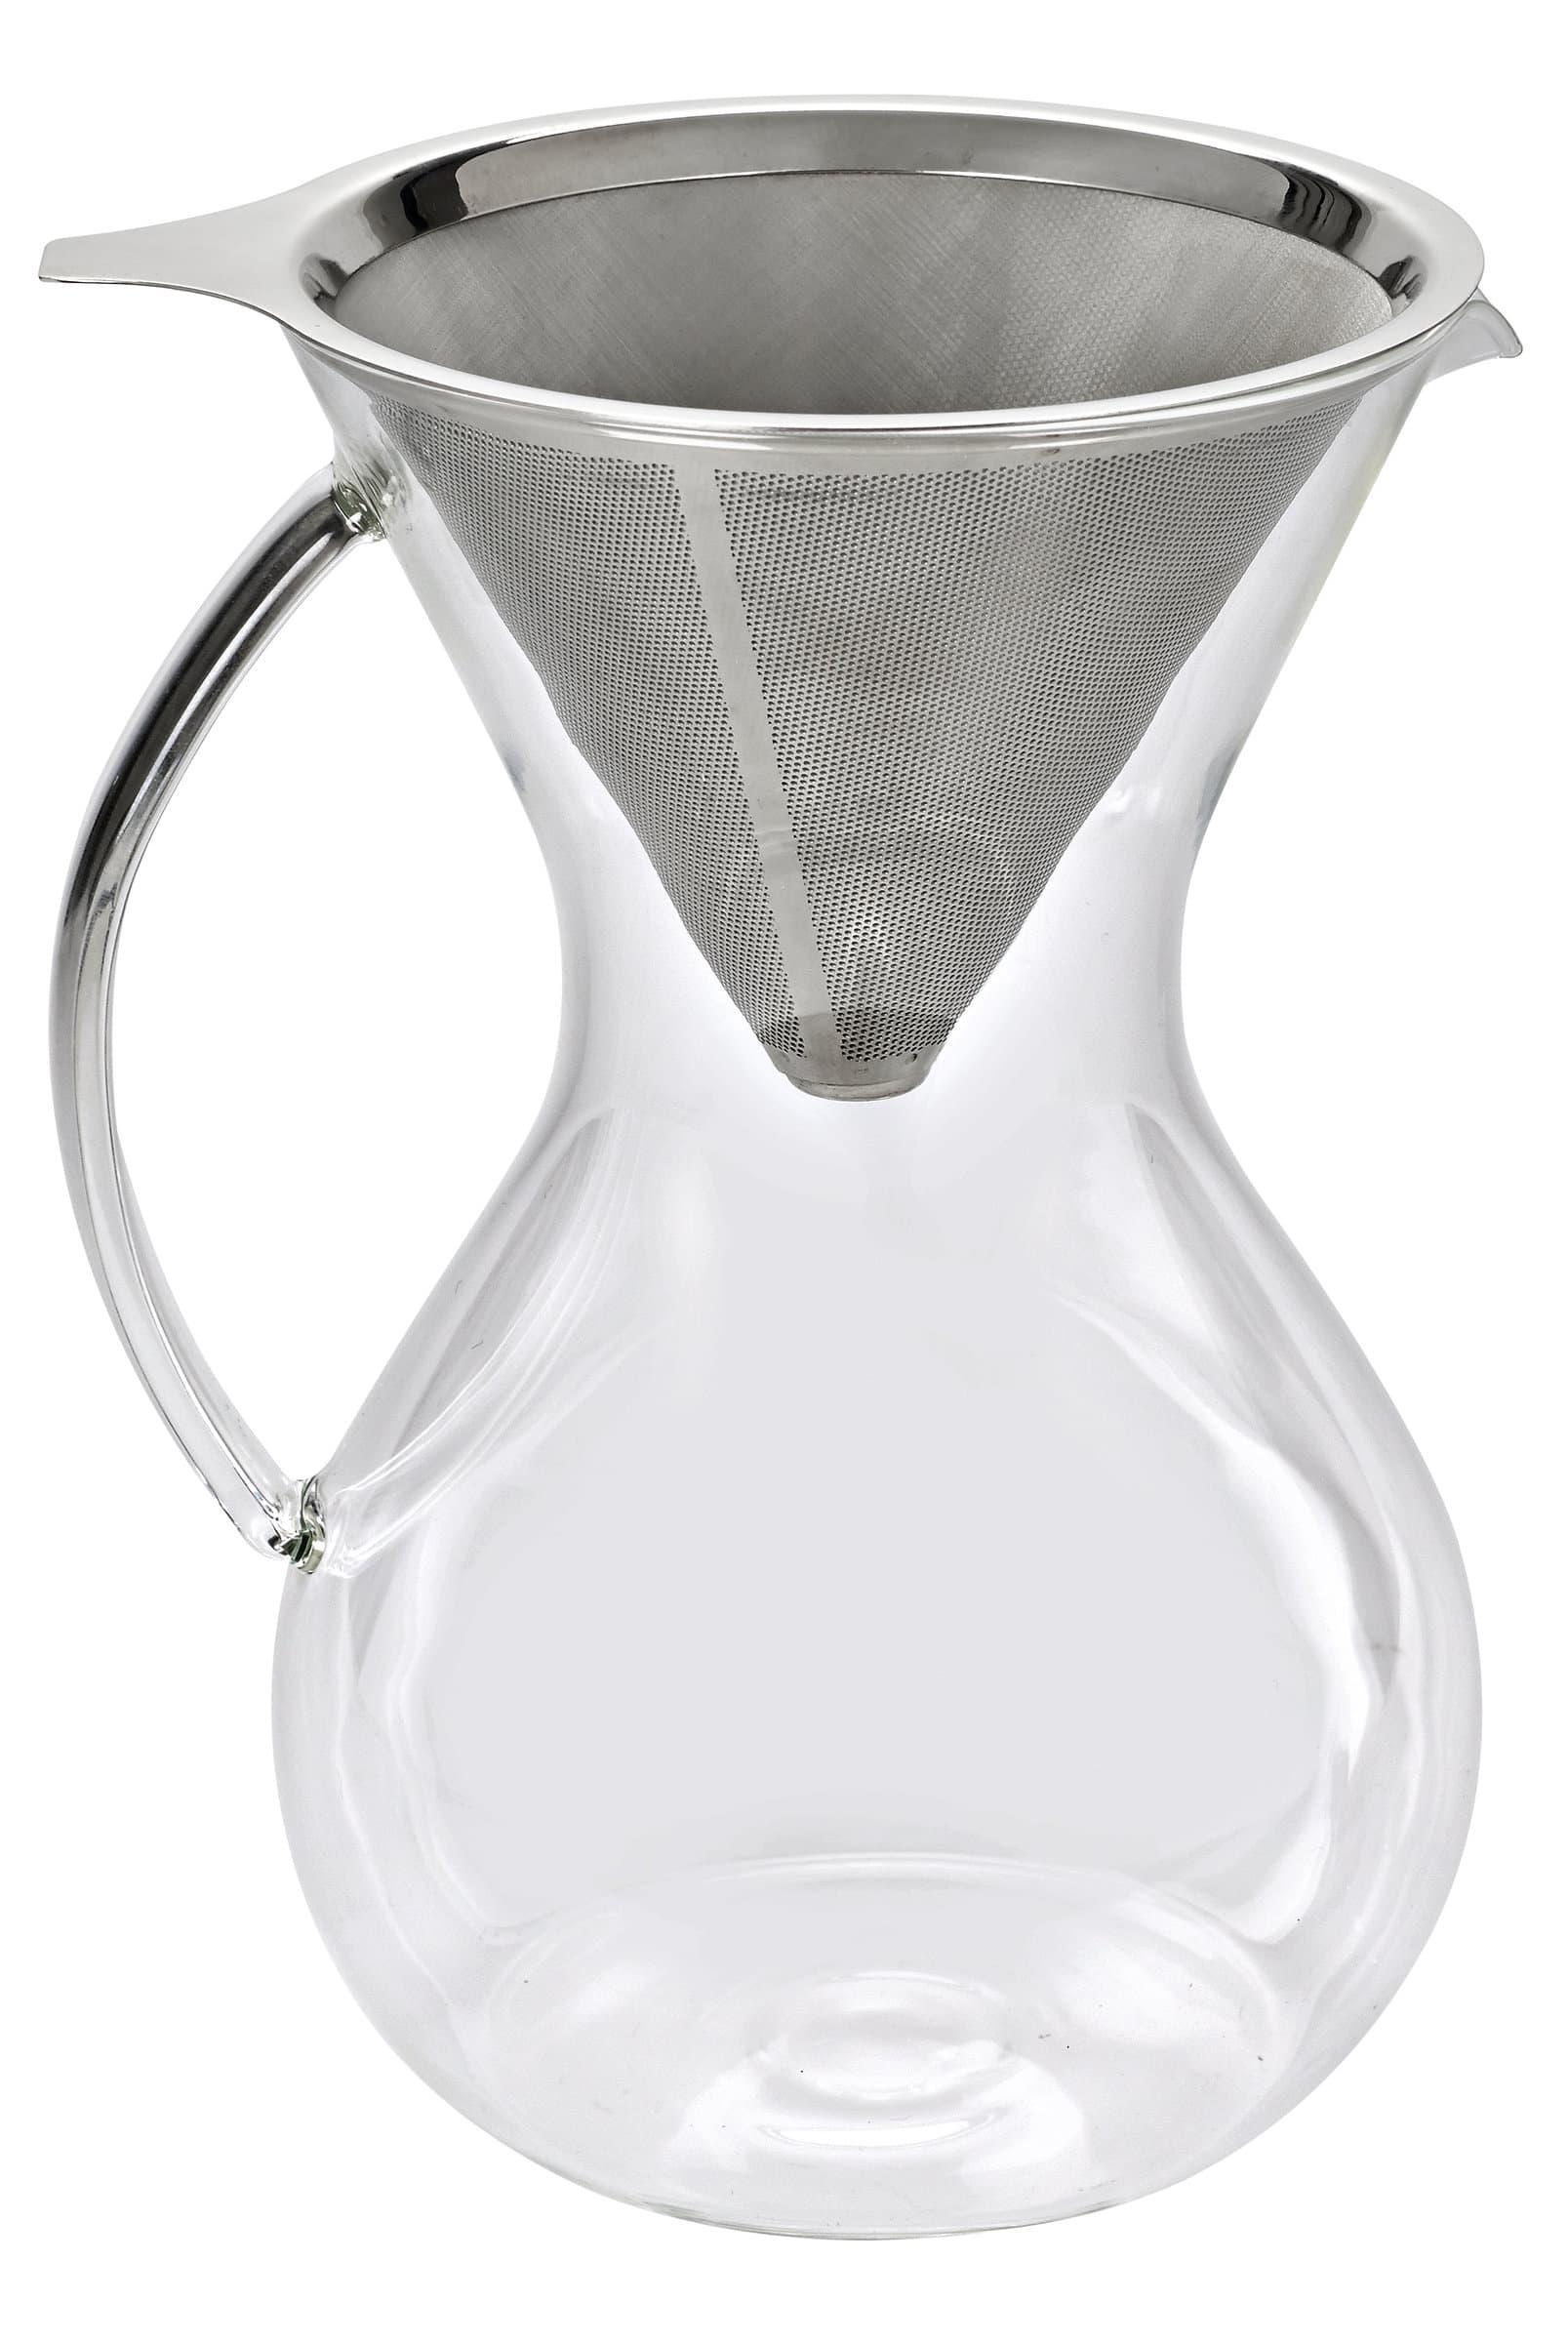 Cucina & Tavola Kaffeezubereiter Set 1L